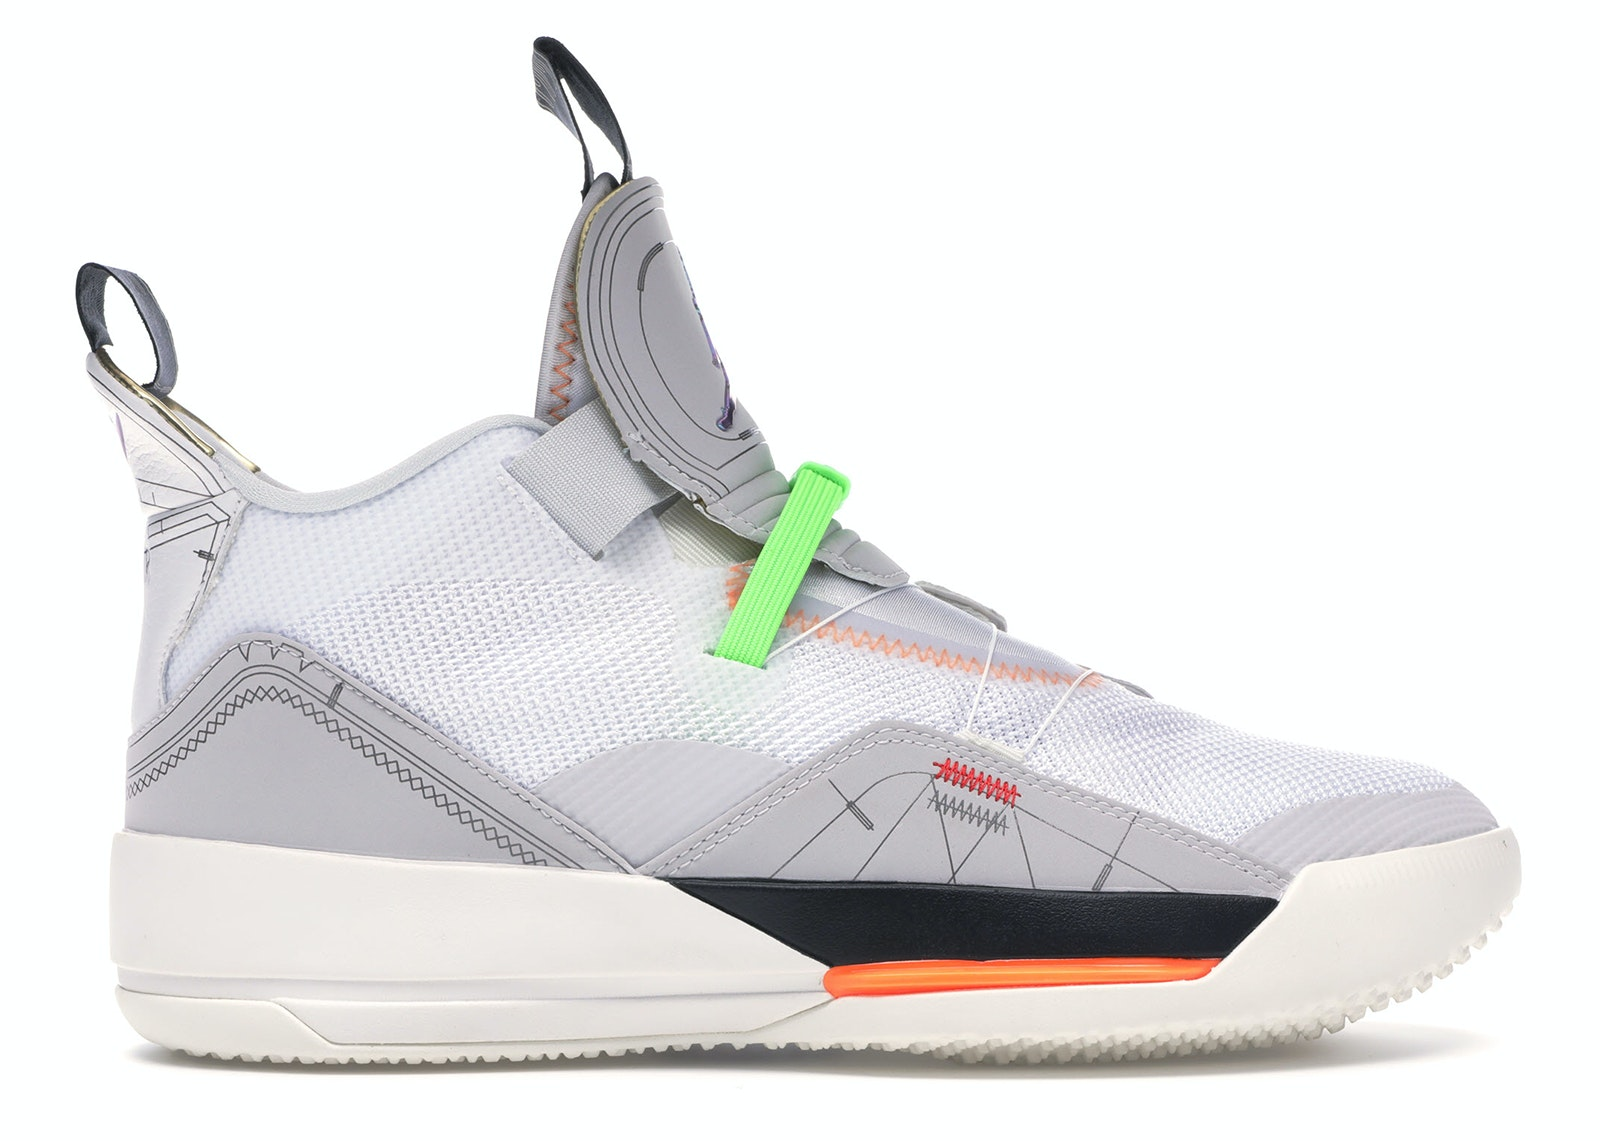 Jordan XXXIII Vast Grey